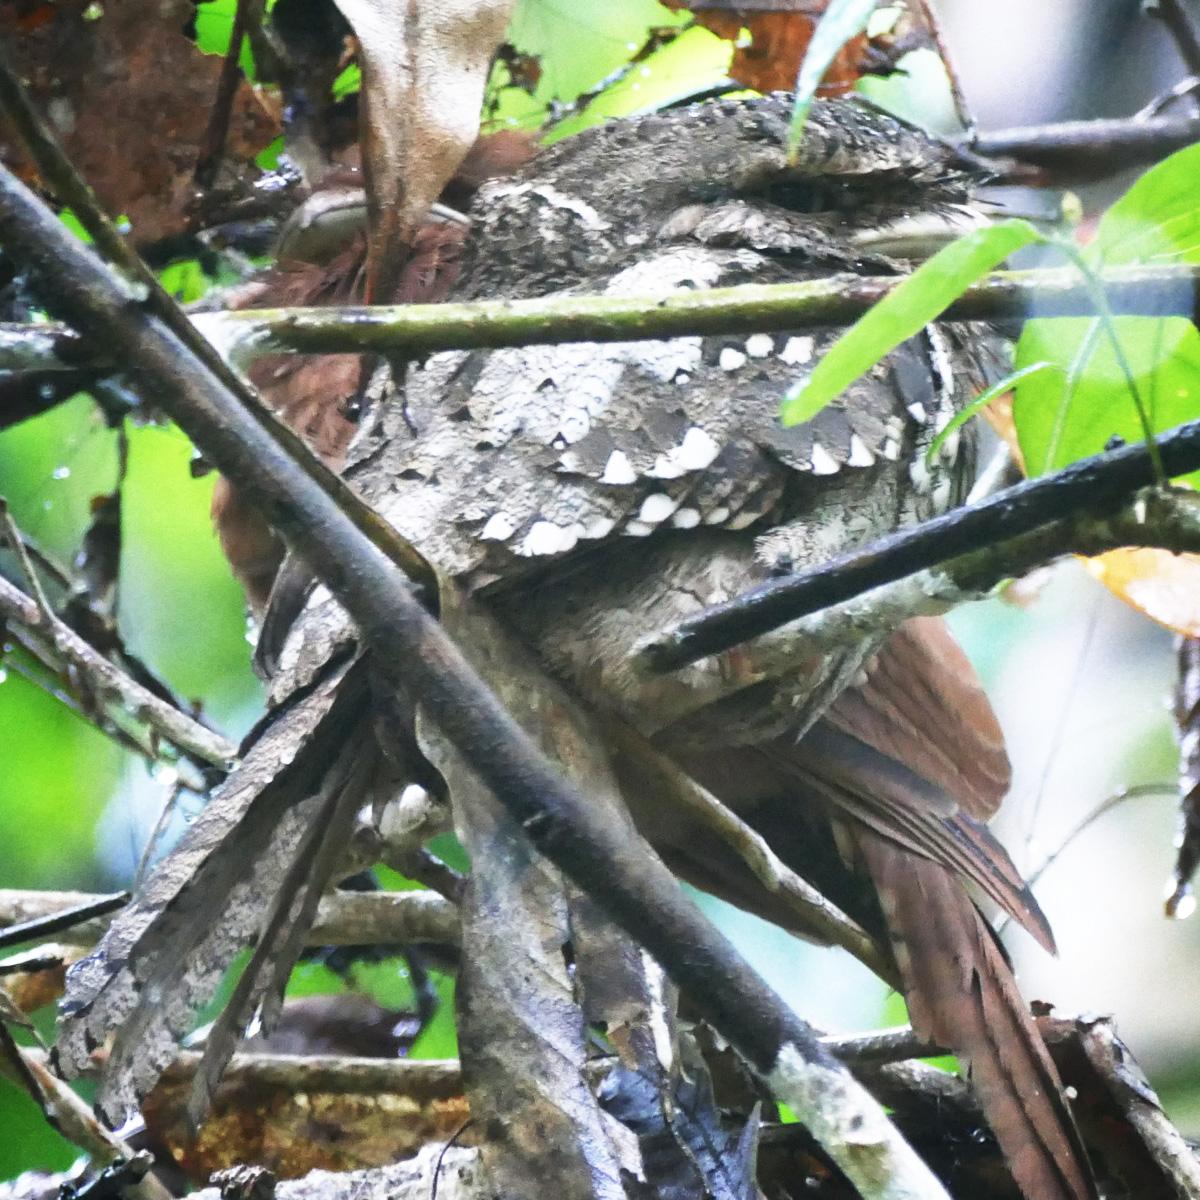 A pair of Sri Lanka Frogmouths, Noah's record-breaking 4,342nd bird of the year. Noah Strycker